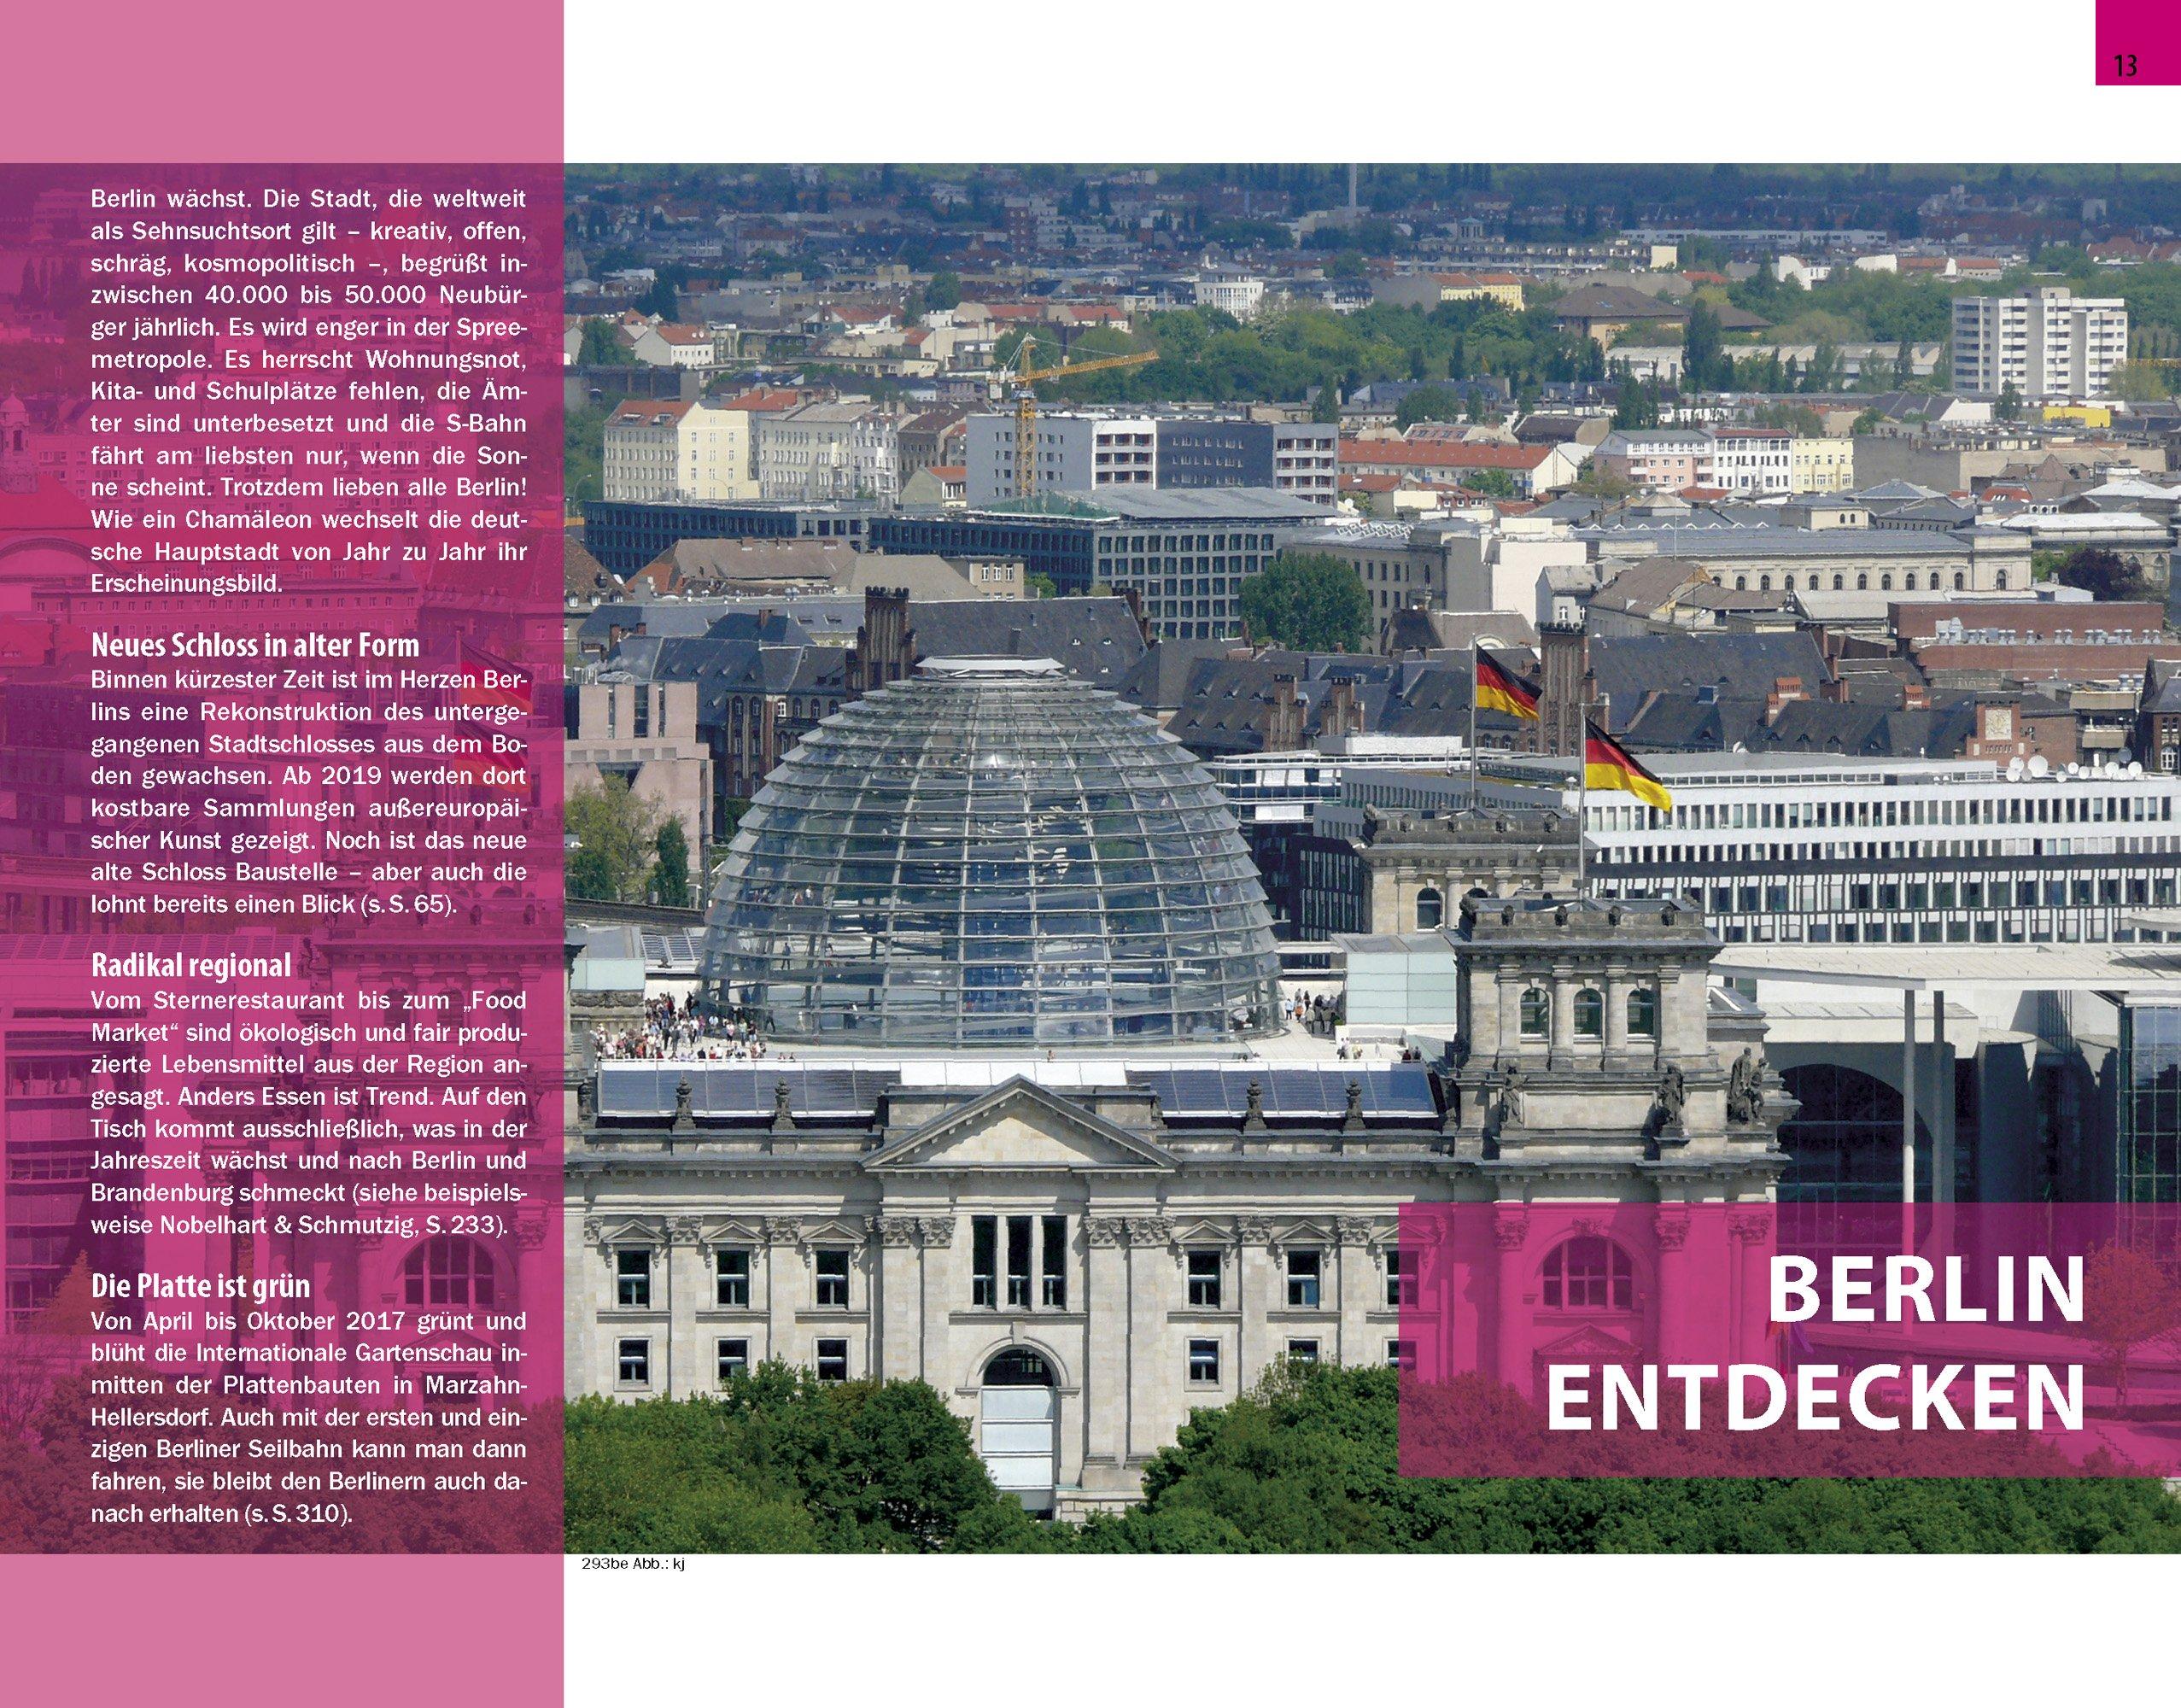 Reise Know How Reiseführer Berlin Mit Potsdam (CityTrip PLUS):  9783831729388: Amazon.com: Books